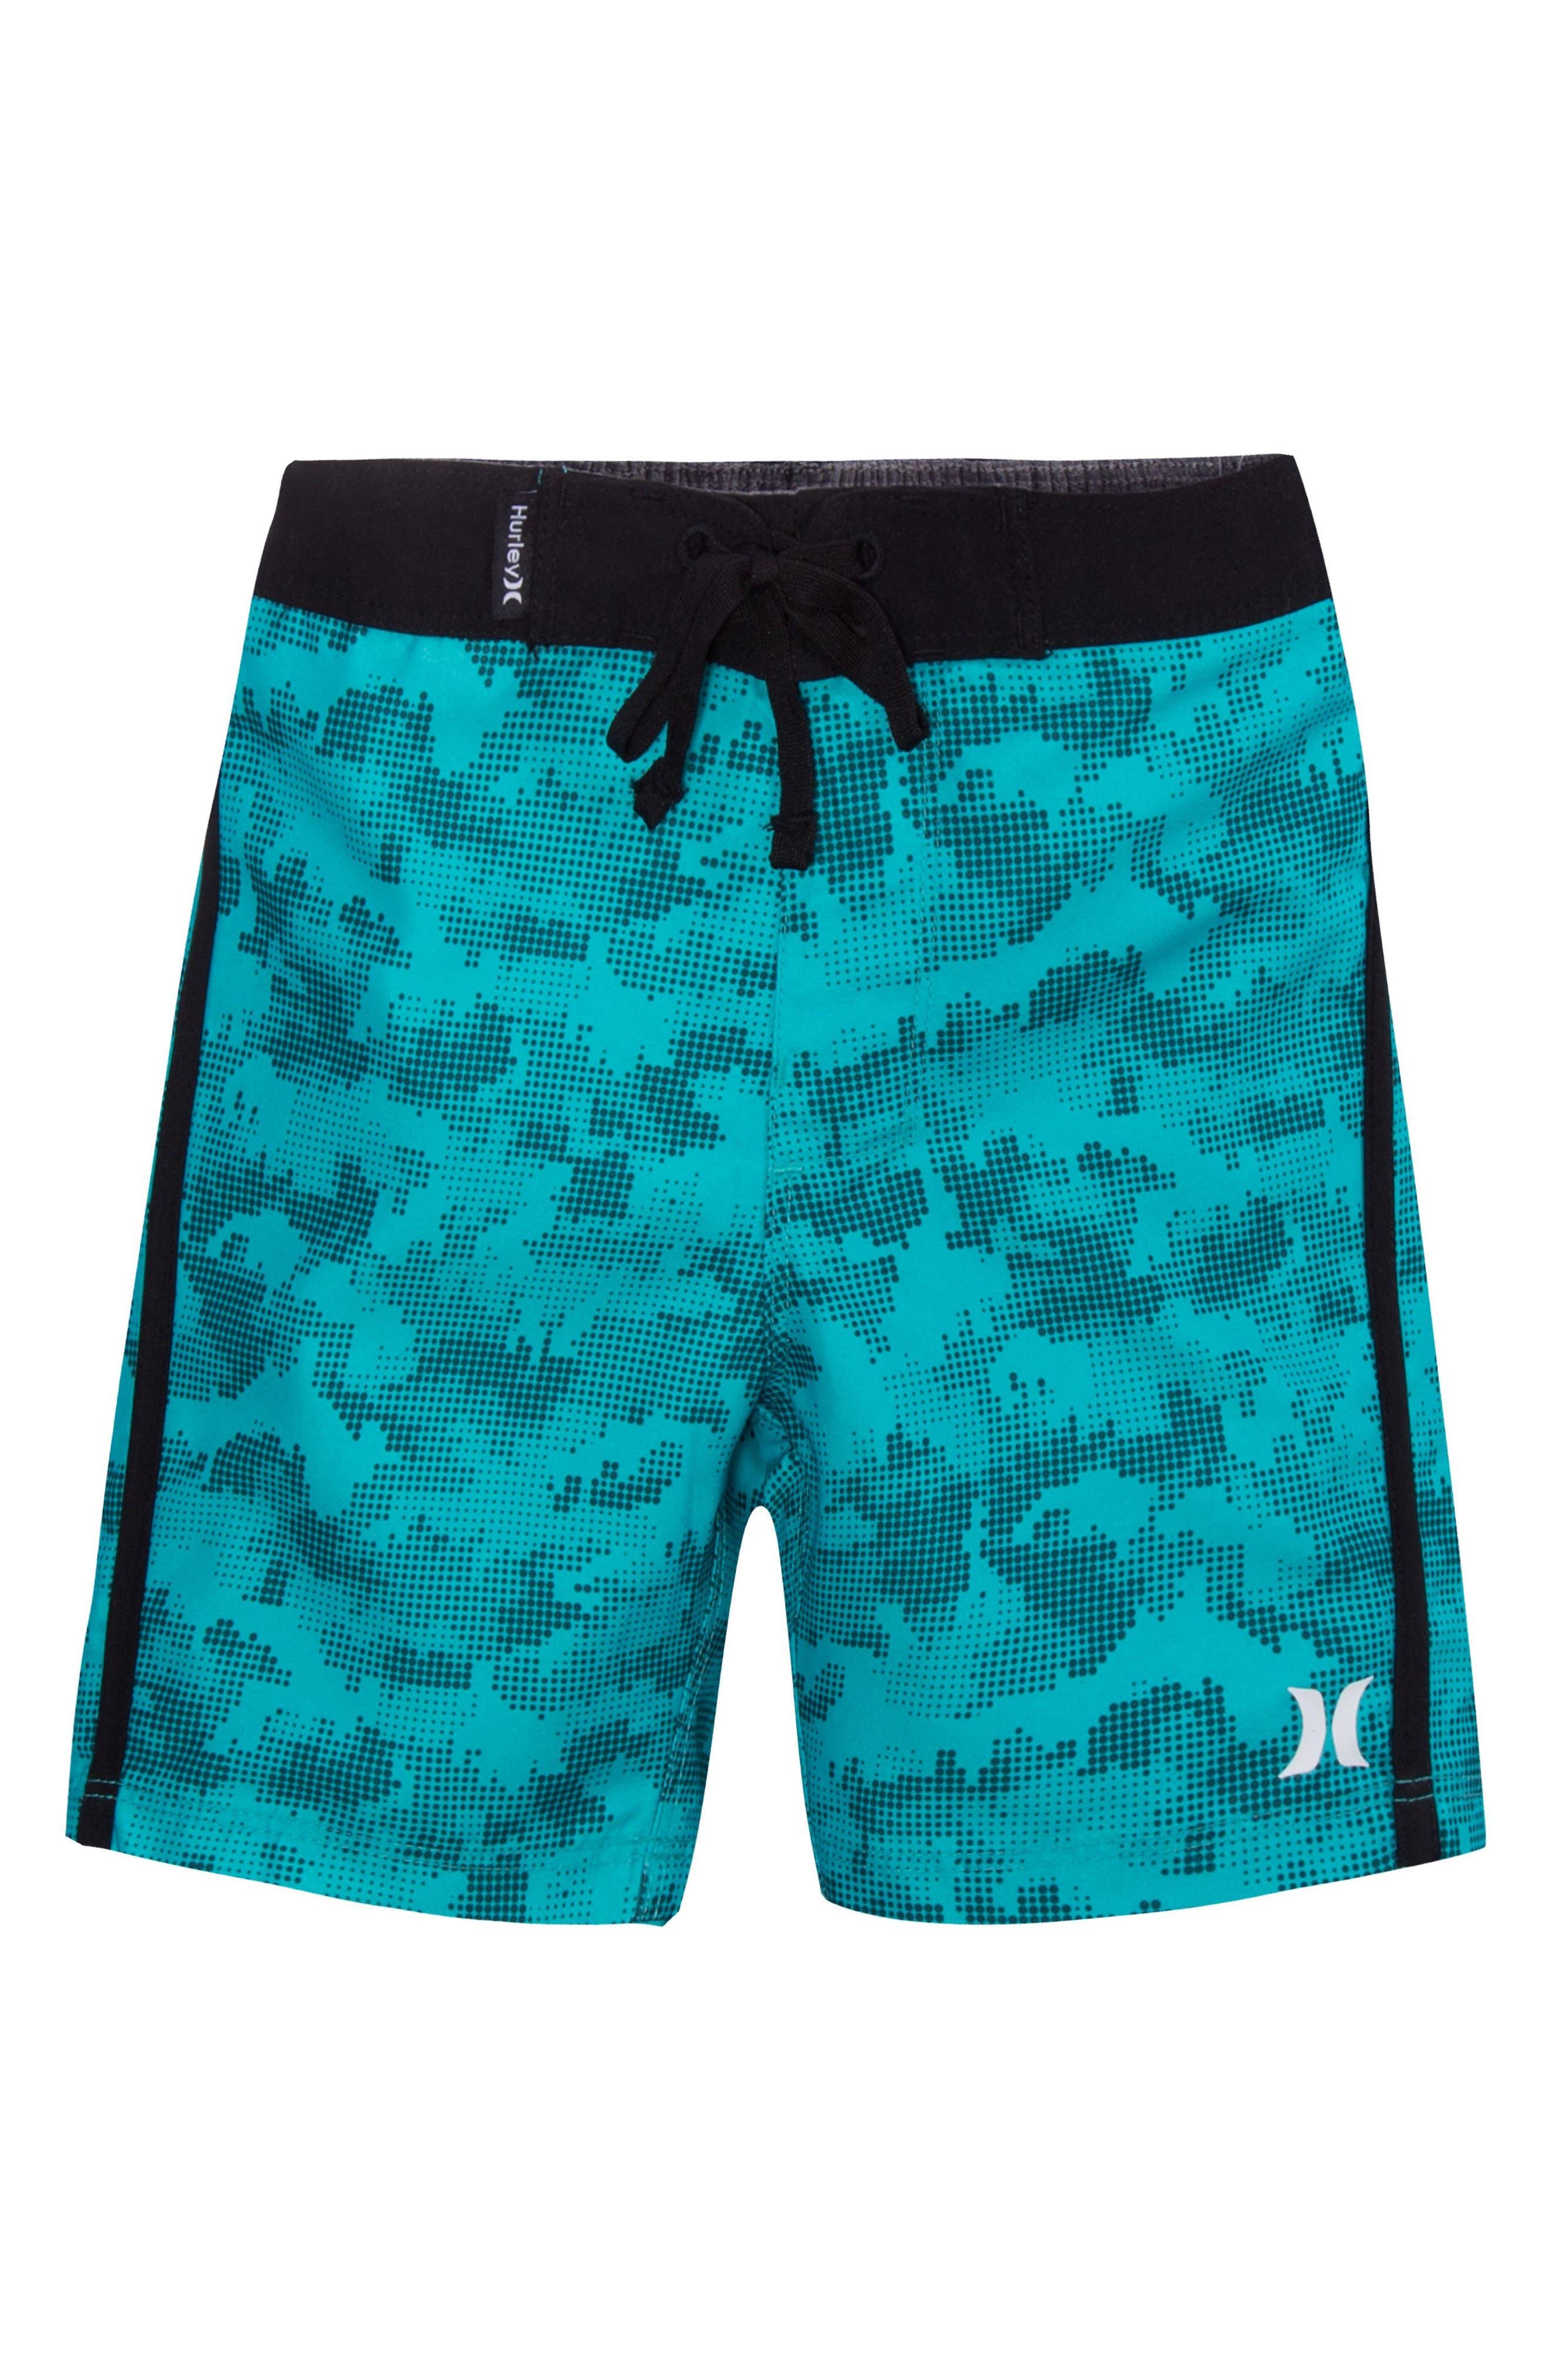 Micro Camo Board Shorts,                         Main,                         color, Clear Jade